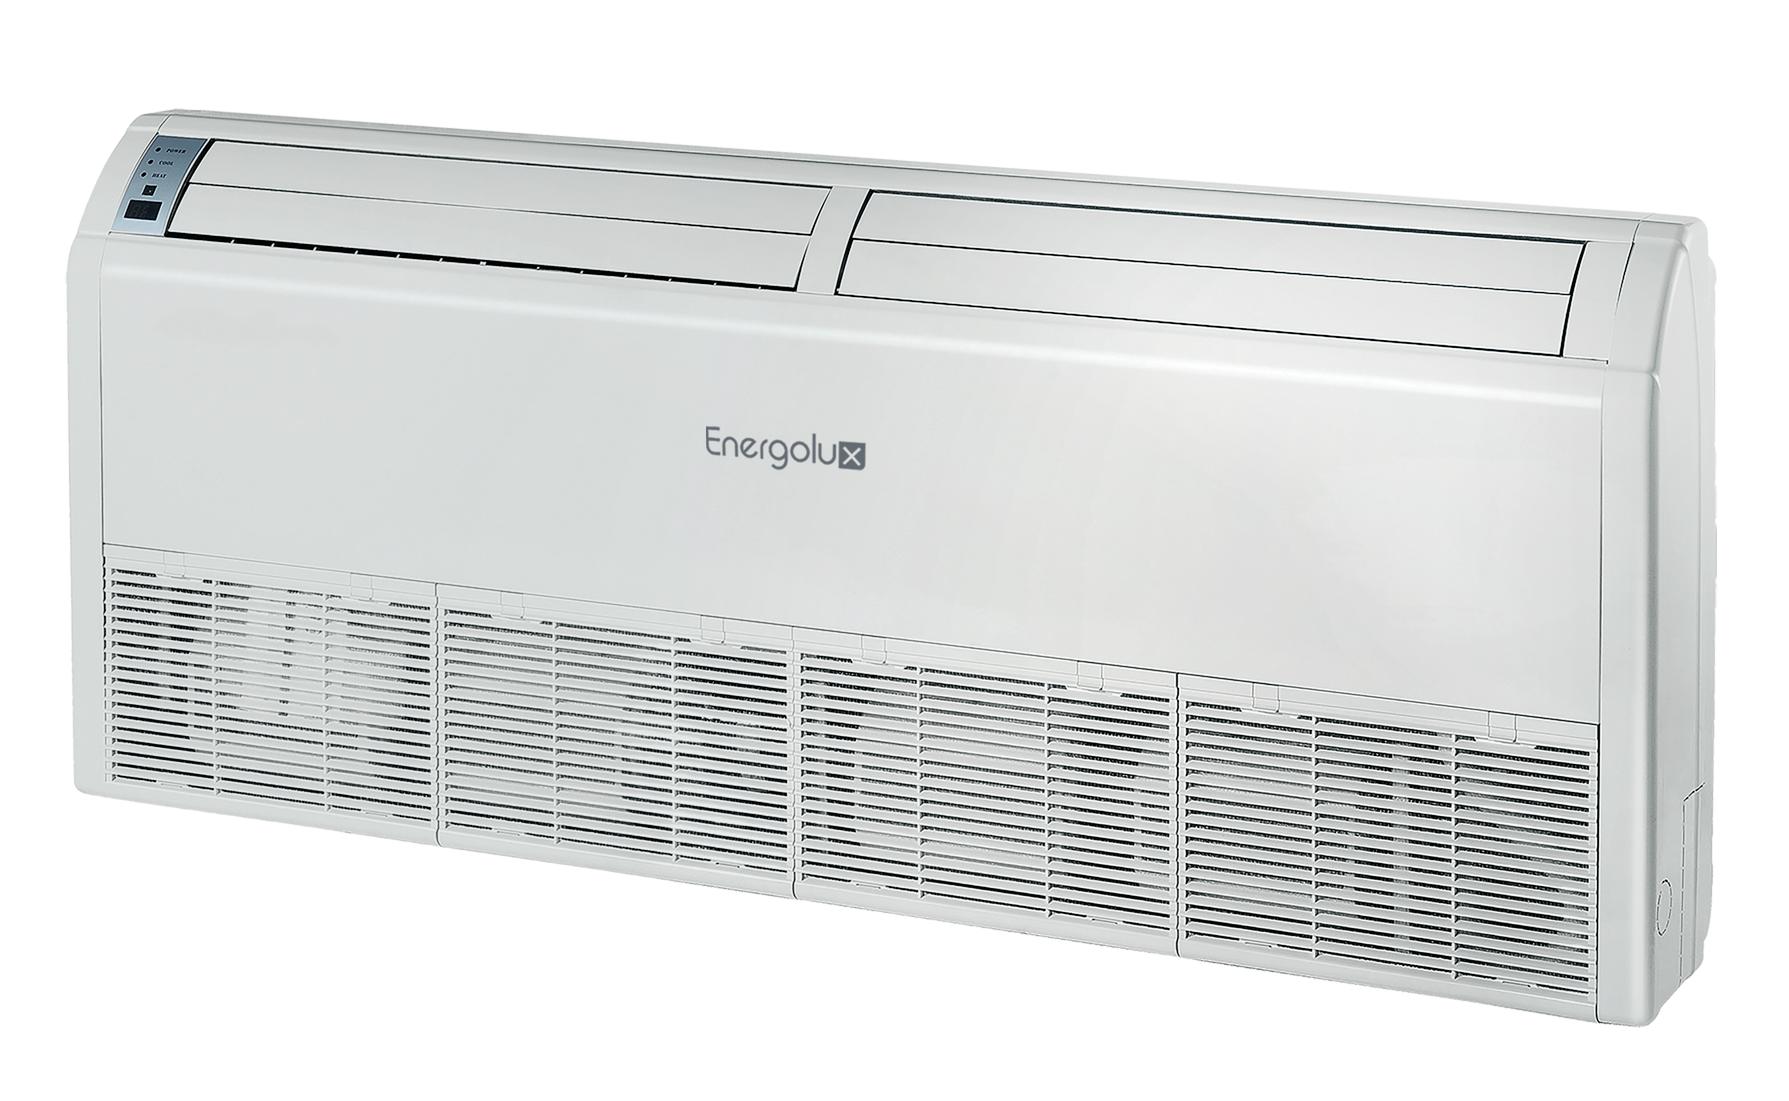 Energolux SMZCF09V2AI